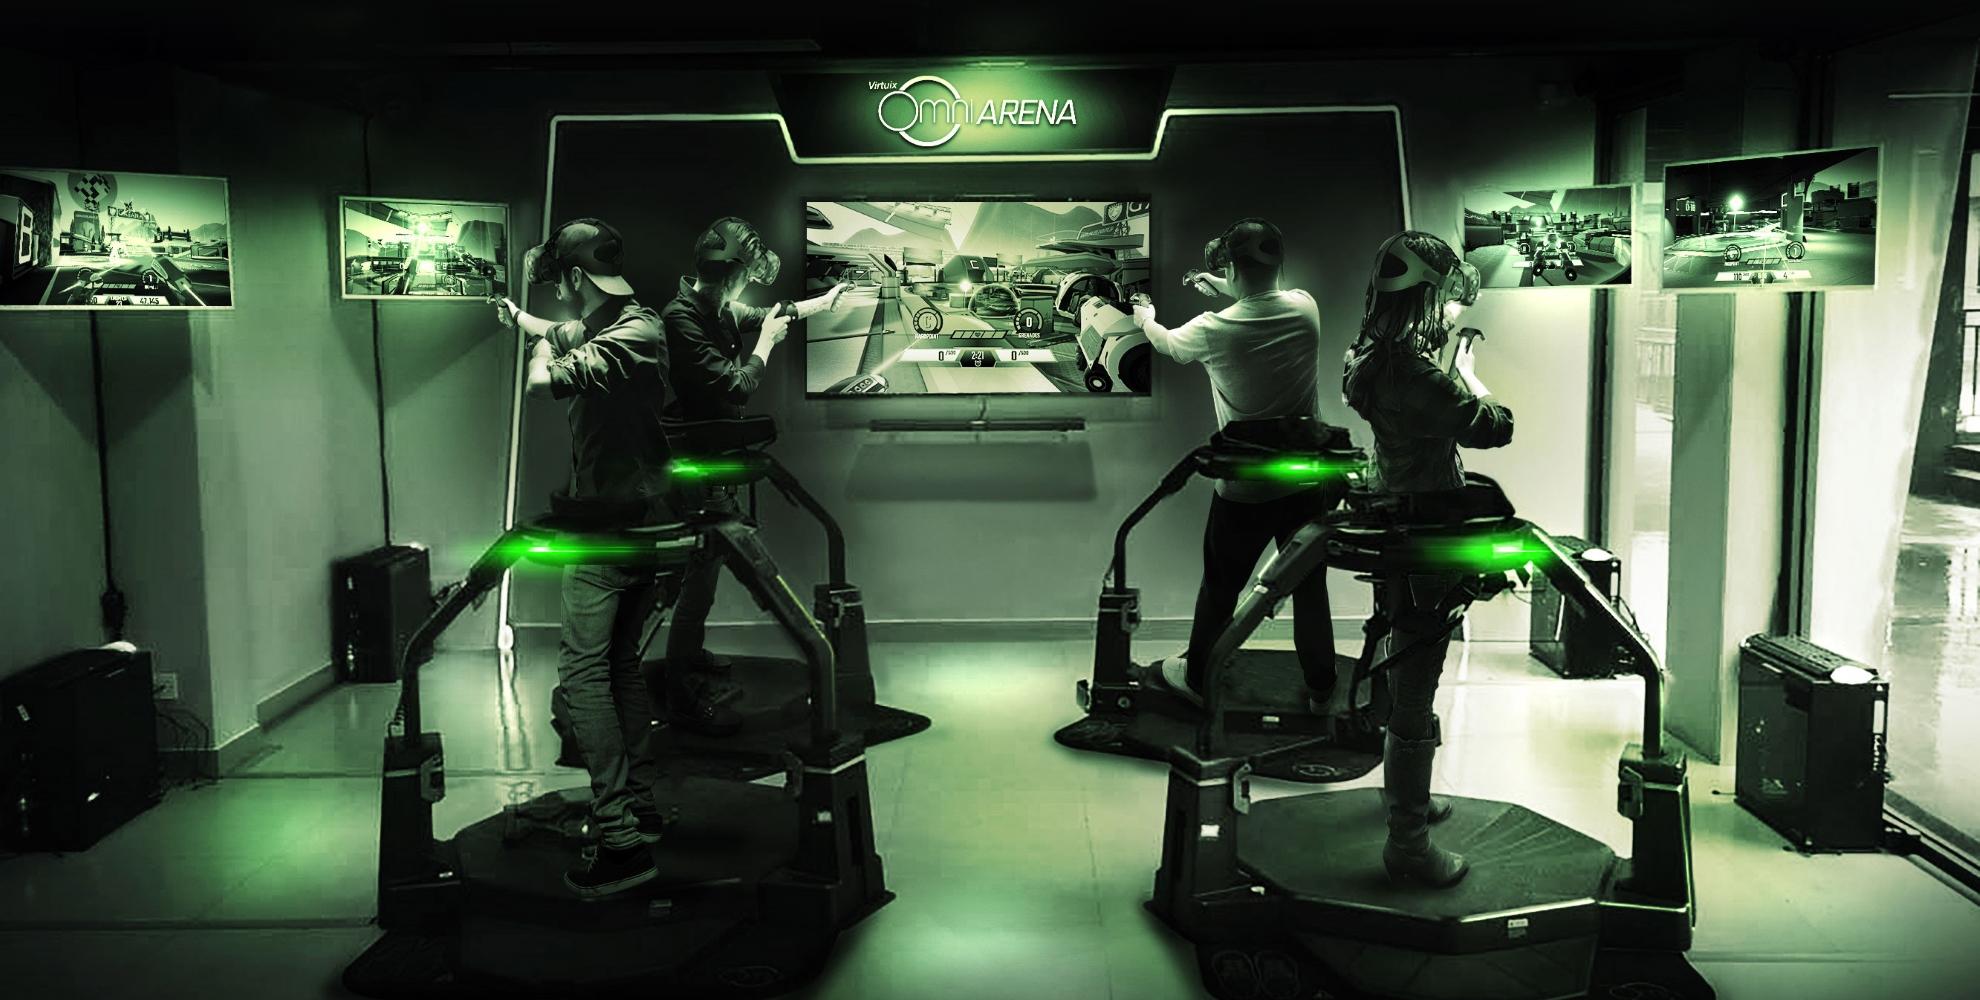 VR-Arena